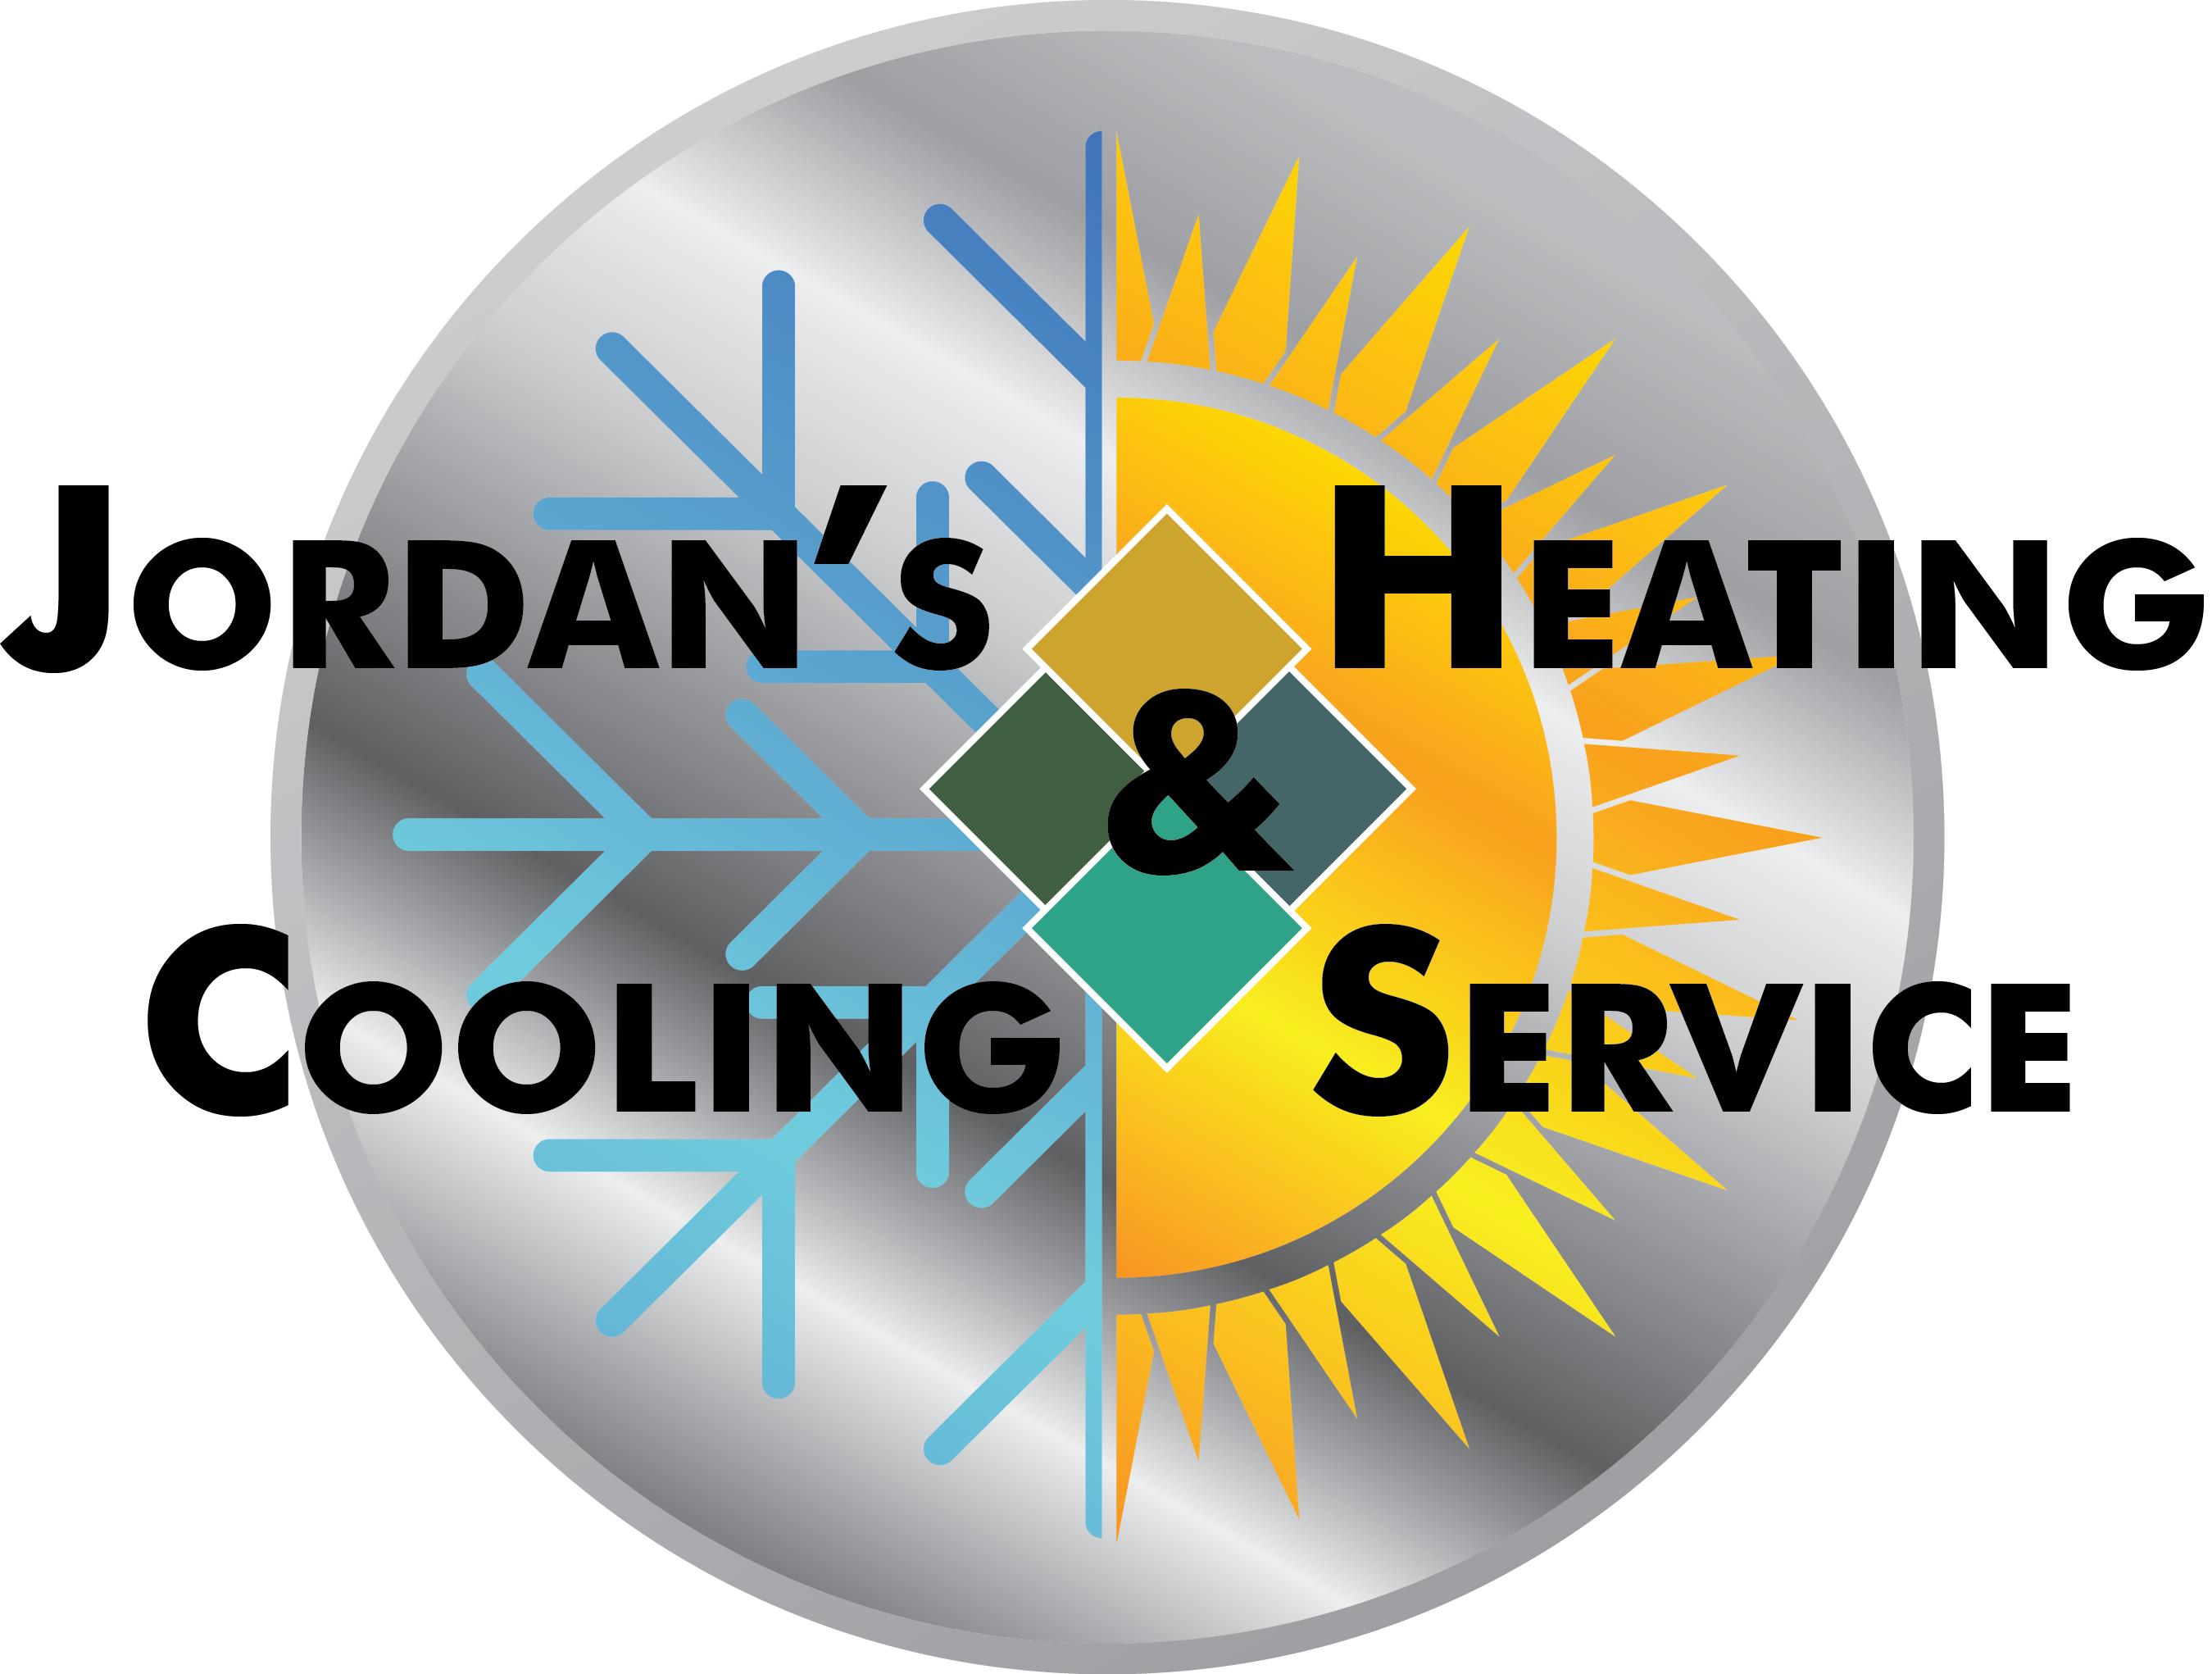 Jordan's Heating & Cooling